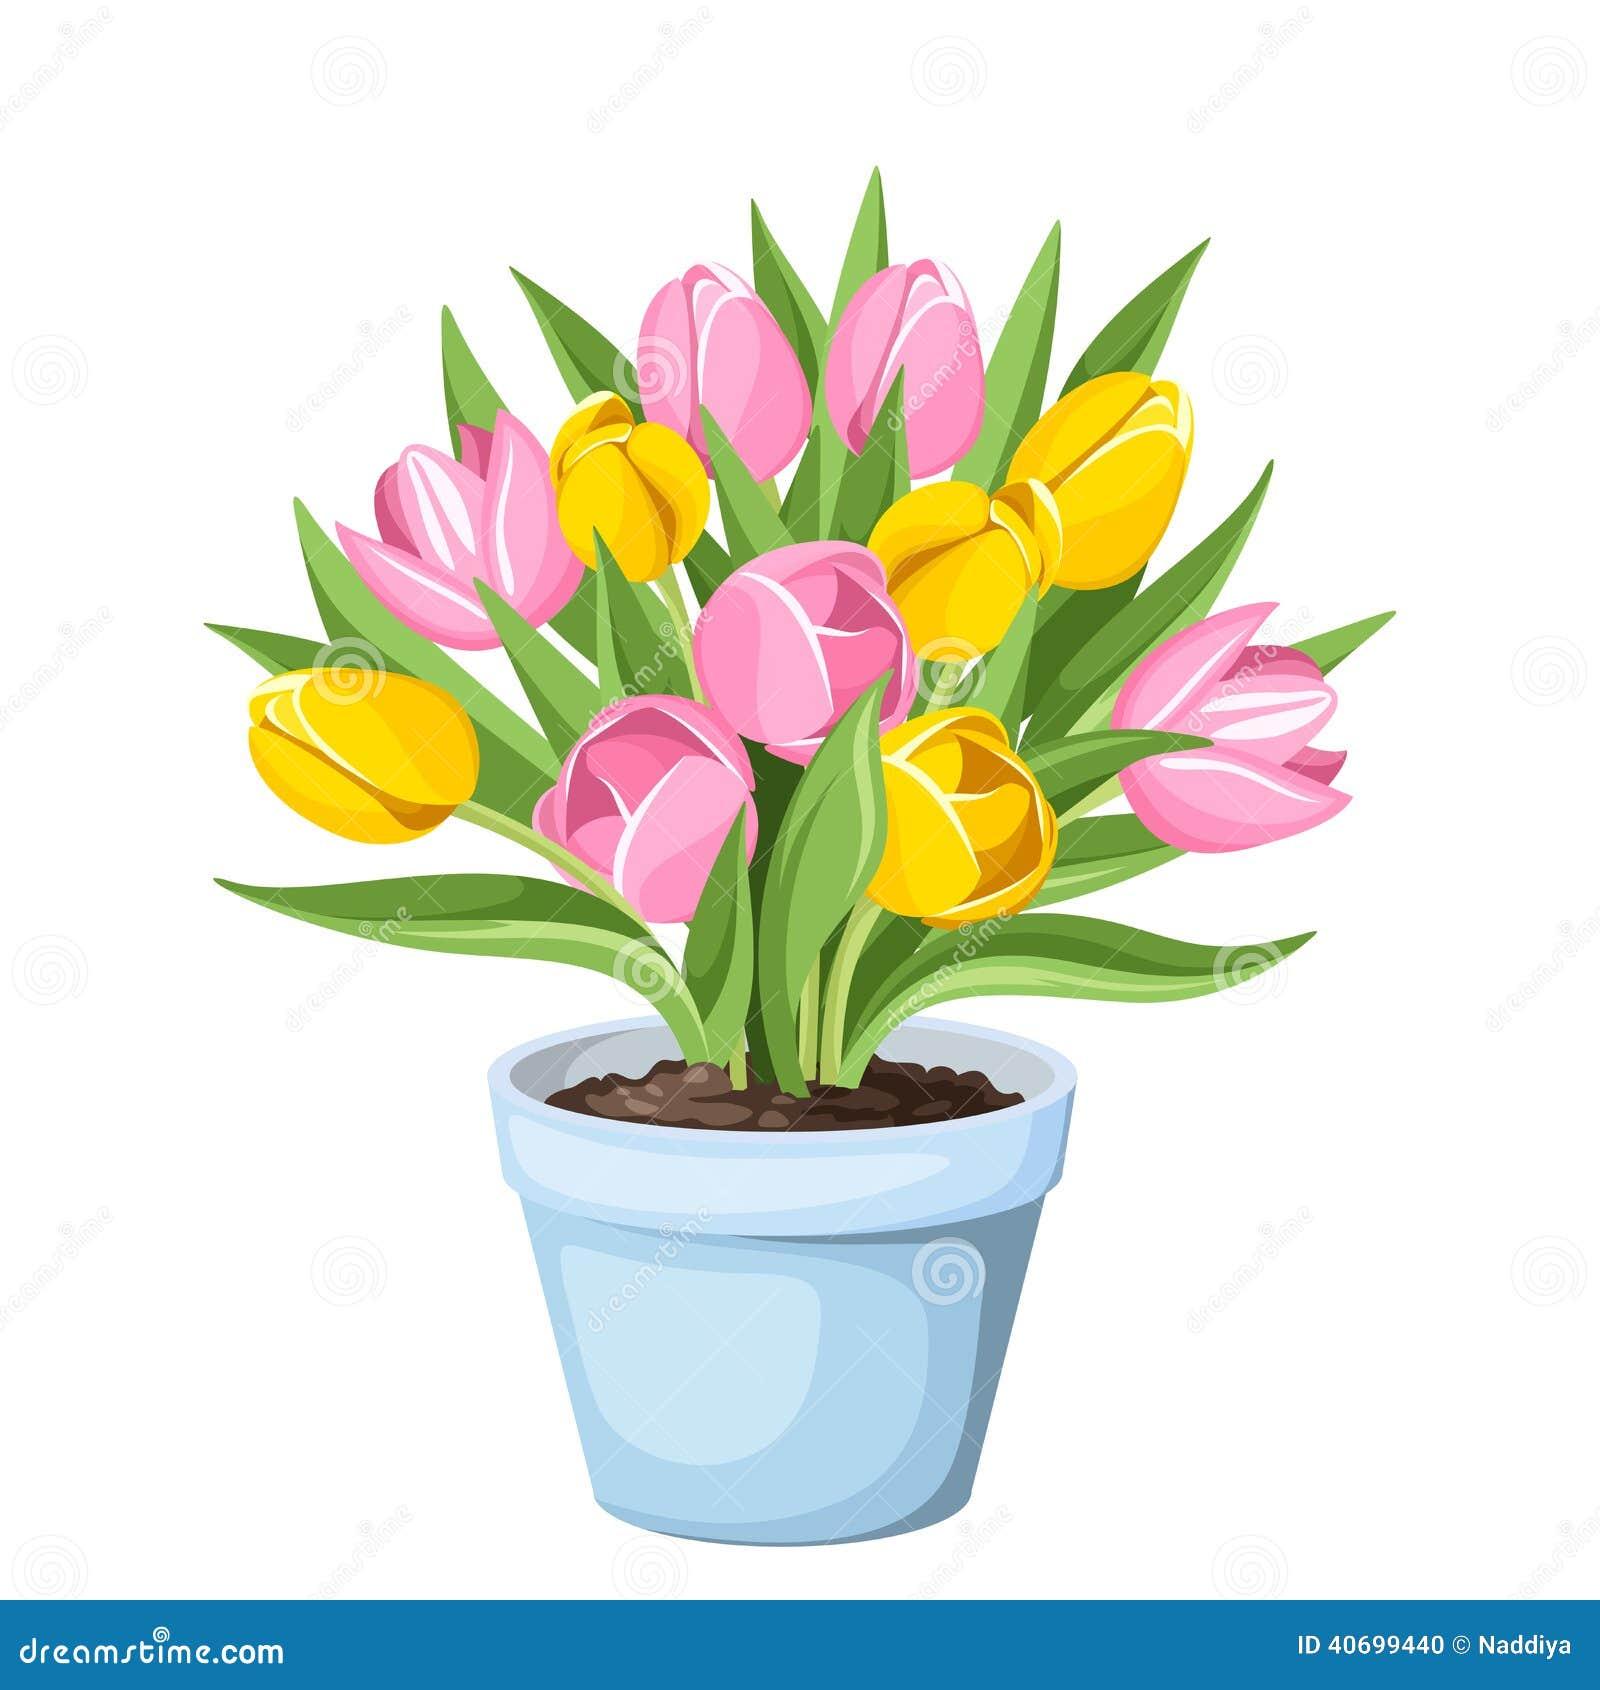 Tulip Flowers In A Pot. Vector Illustration. Stock Vector